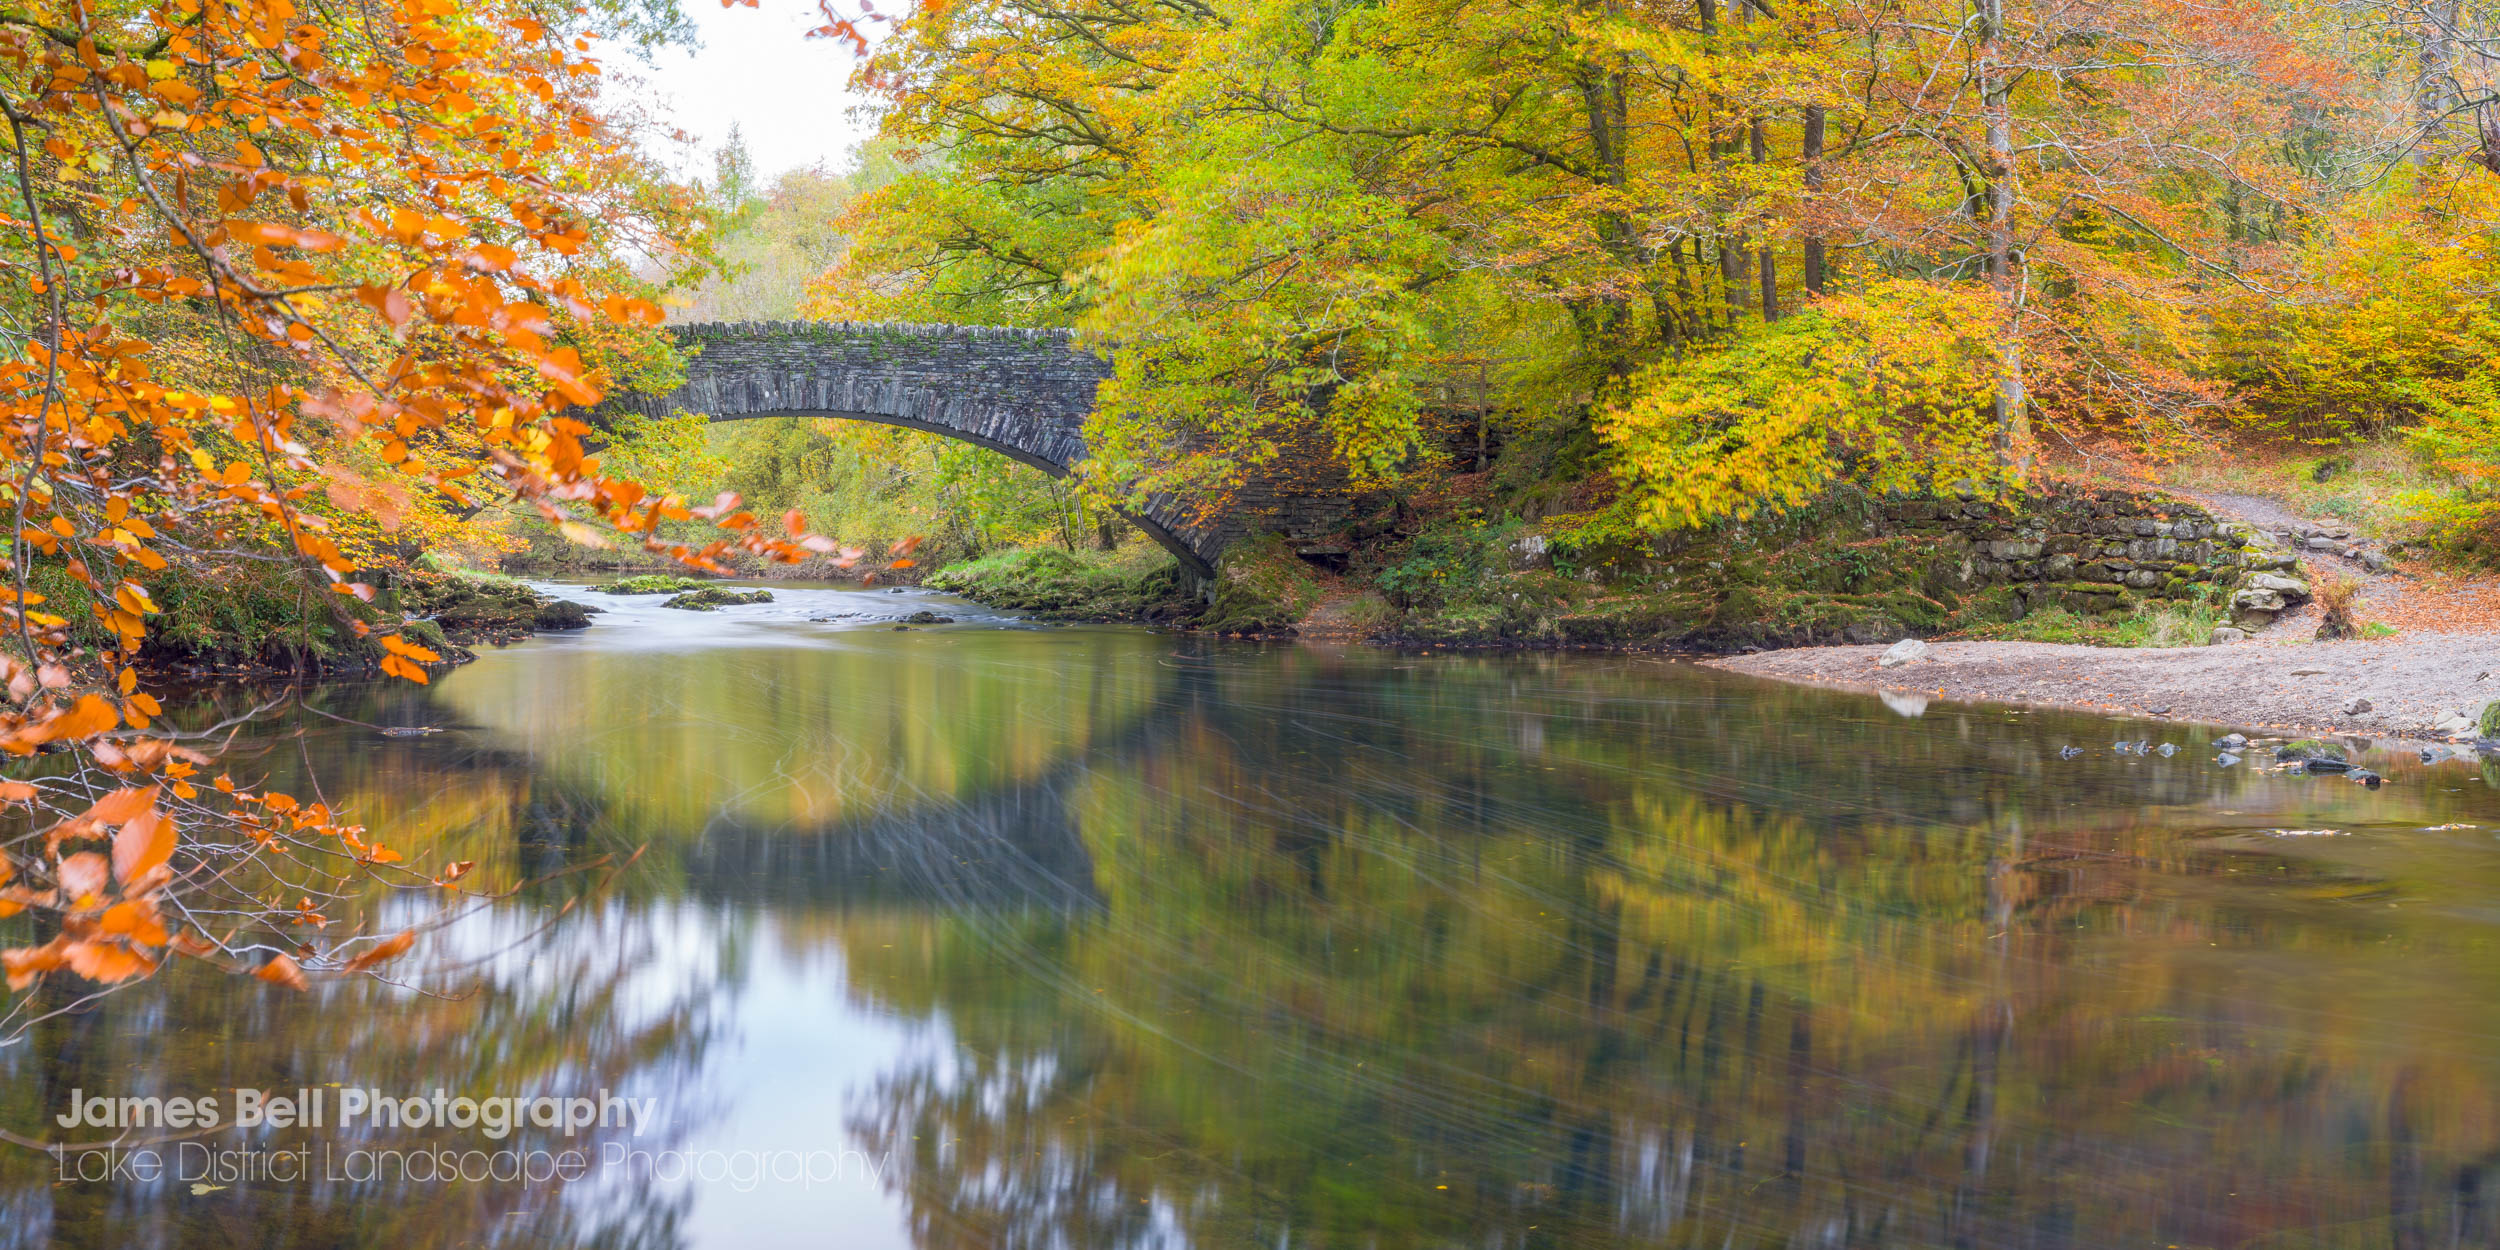 Clappersgate Bridge over the River Brathay in Autumn